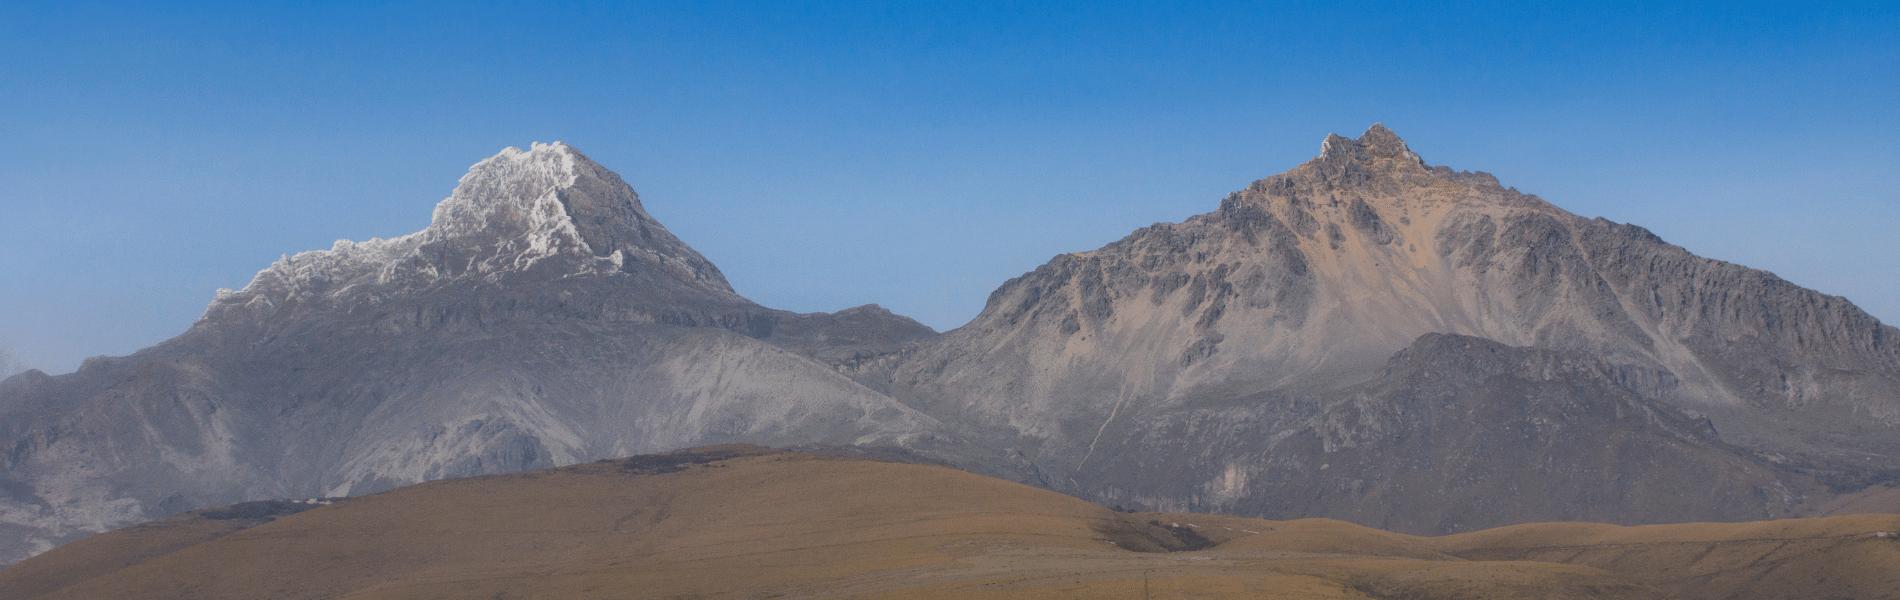 The Ilinizas Climb/Trek